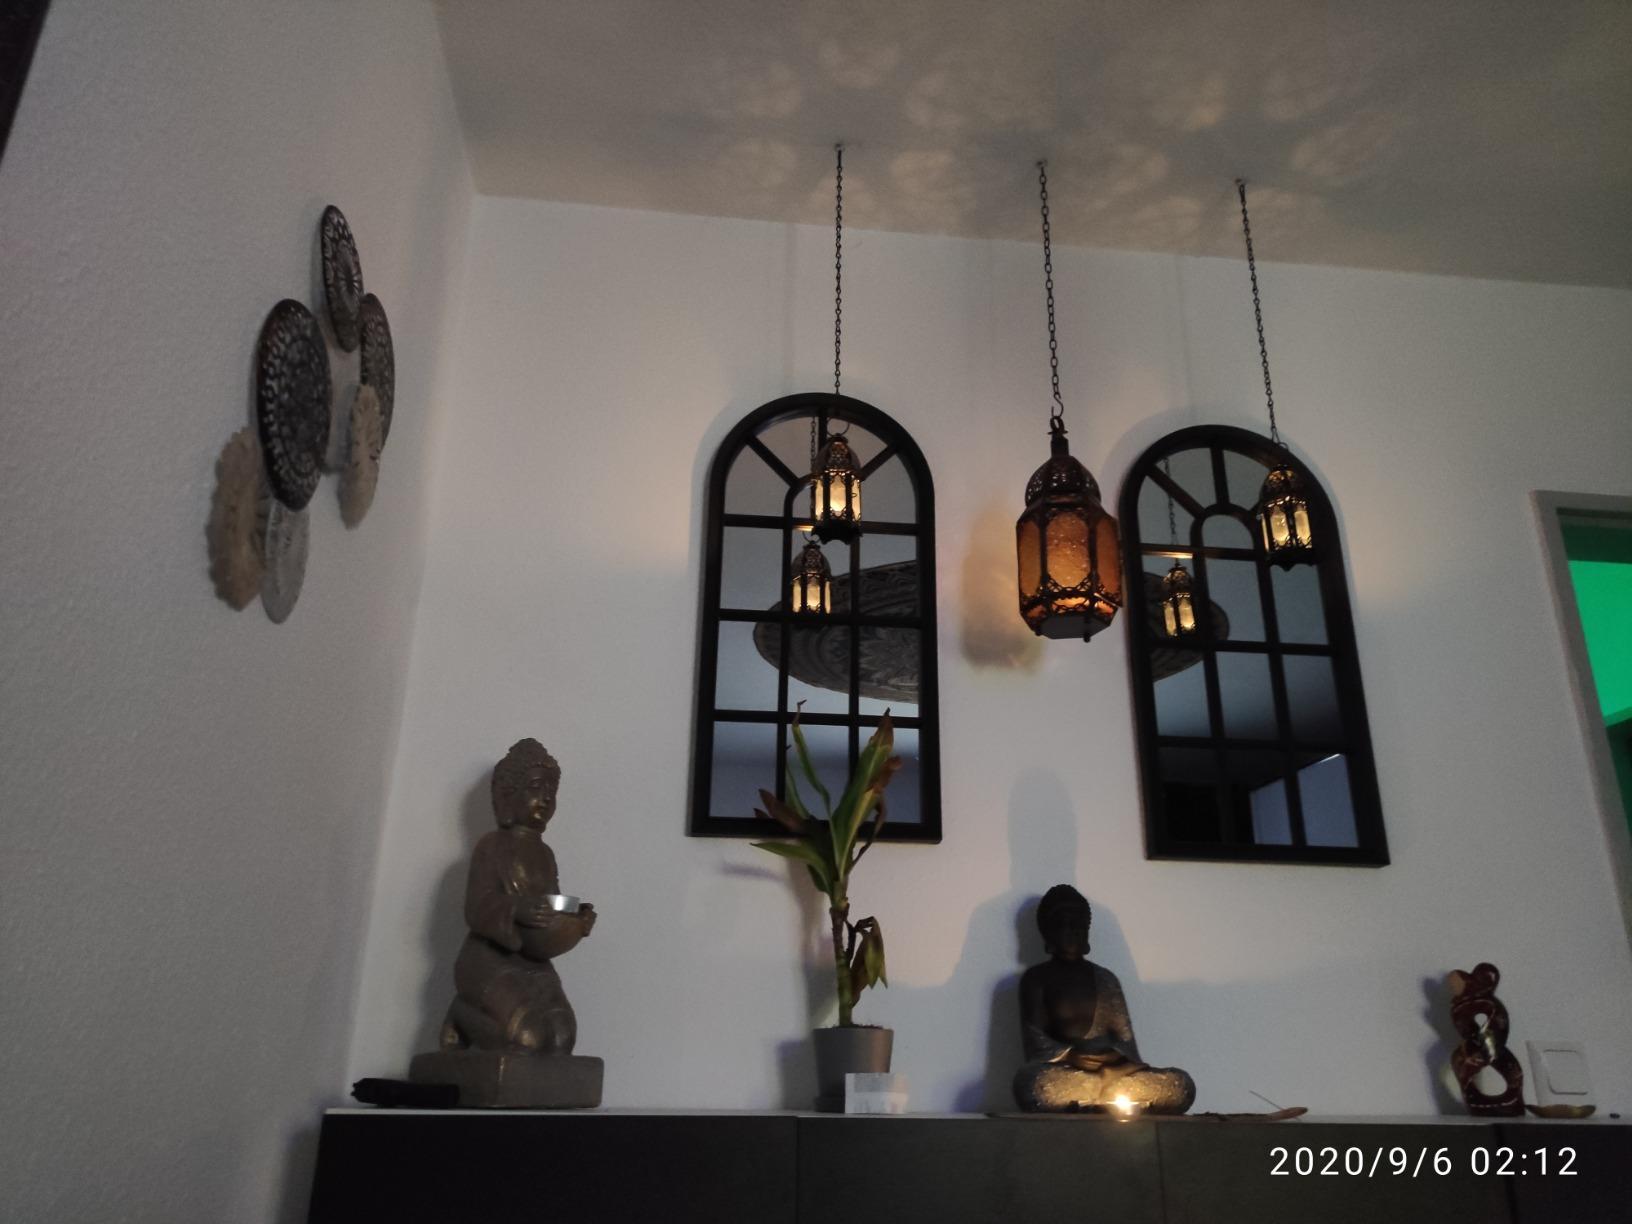 2 x Marokkanische Stil Kerzen Laterne photo review